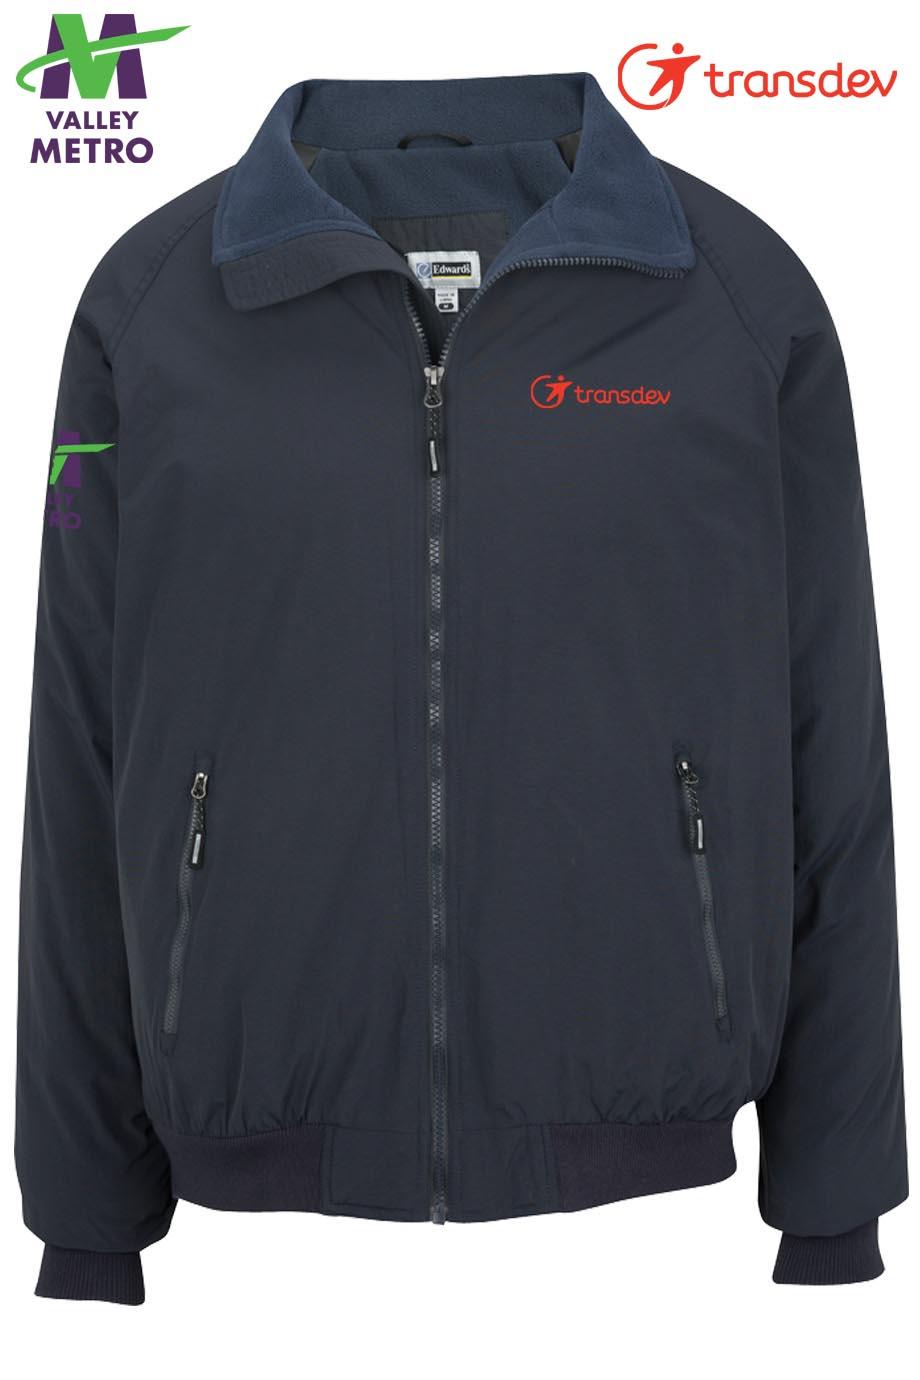 Operator 3-Season Jacket-Capp Uniform Services